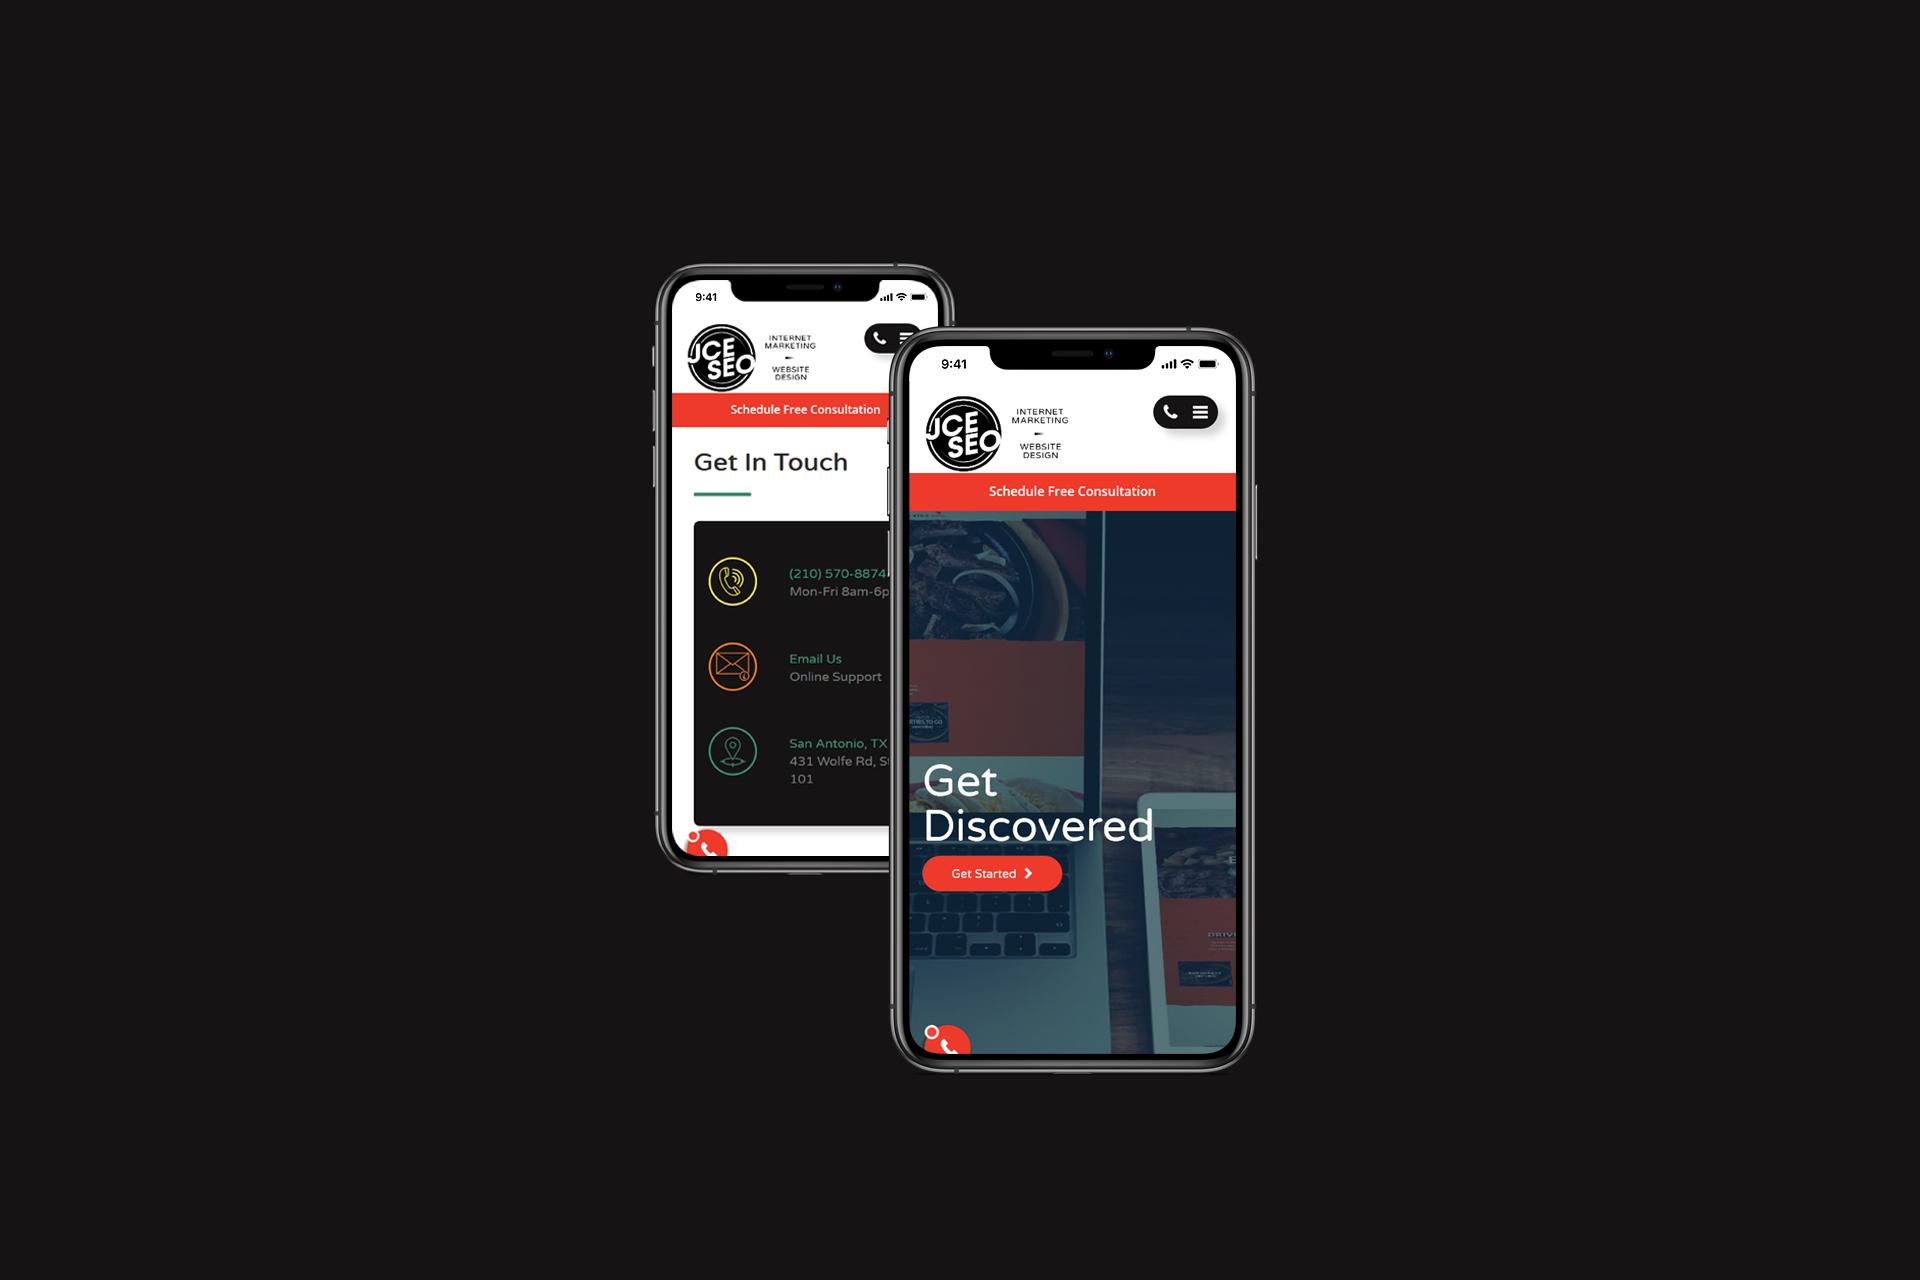 Digital Marketing Agency Mobile Website | Web Development and Design | E'finit Media San Antonio